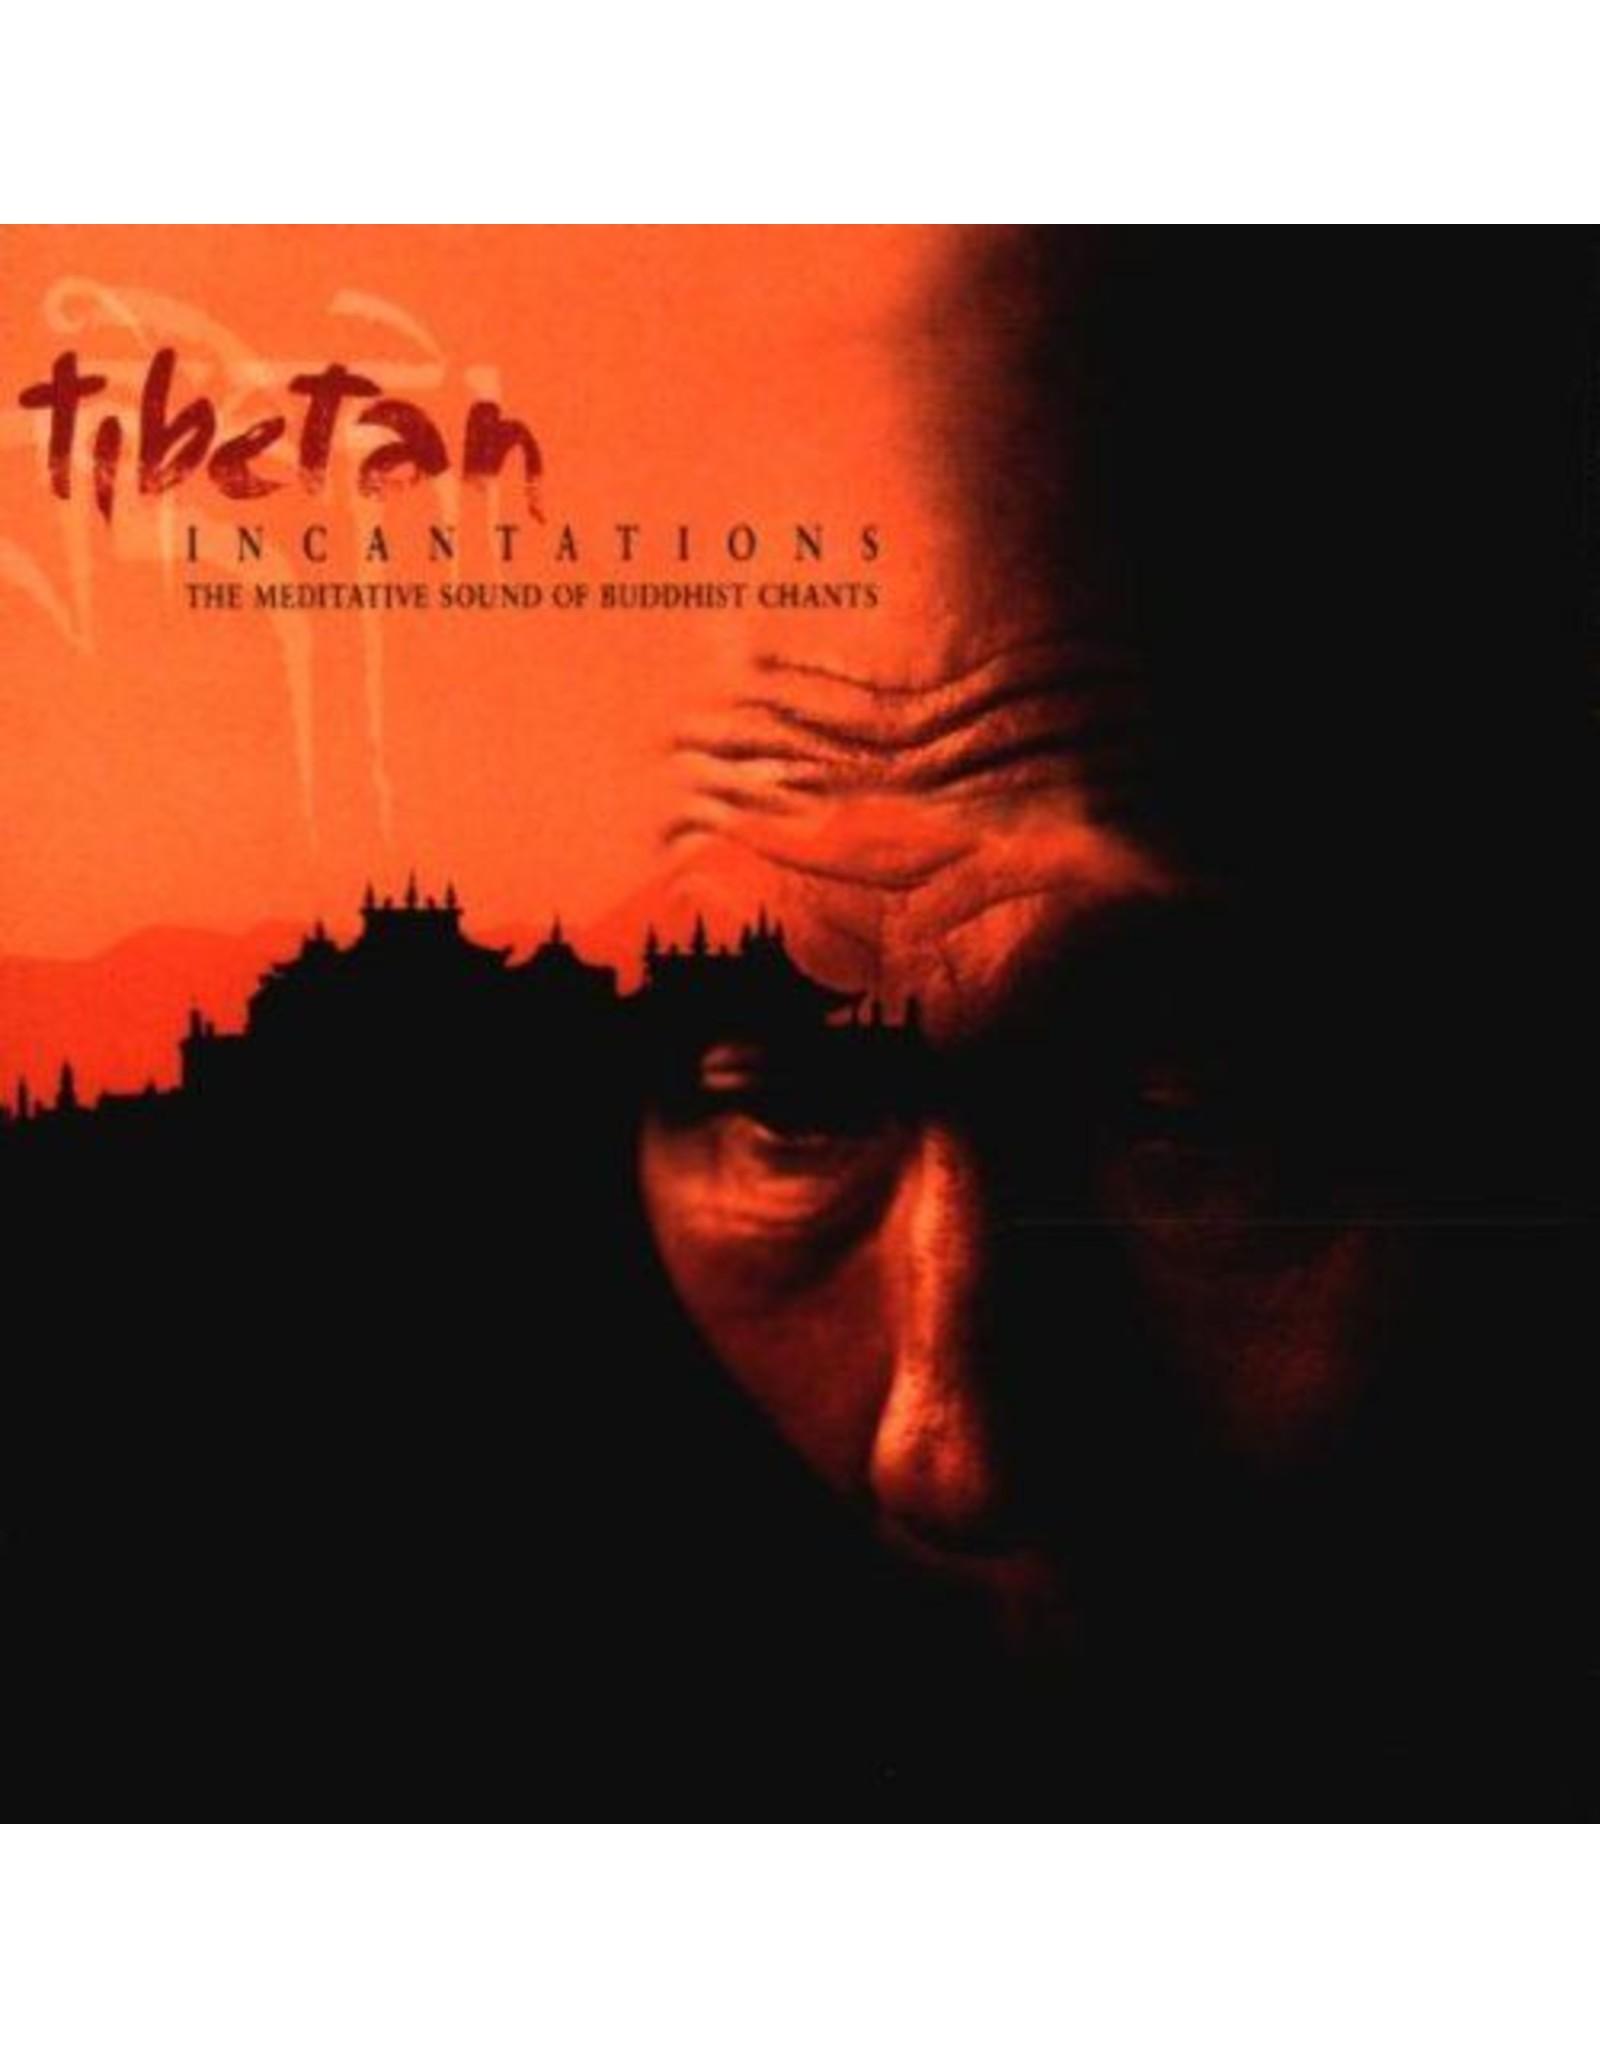 Dakini Tibetan incantations